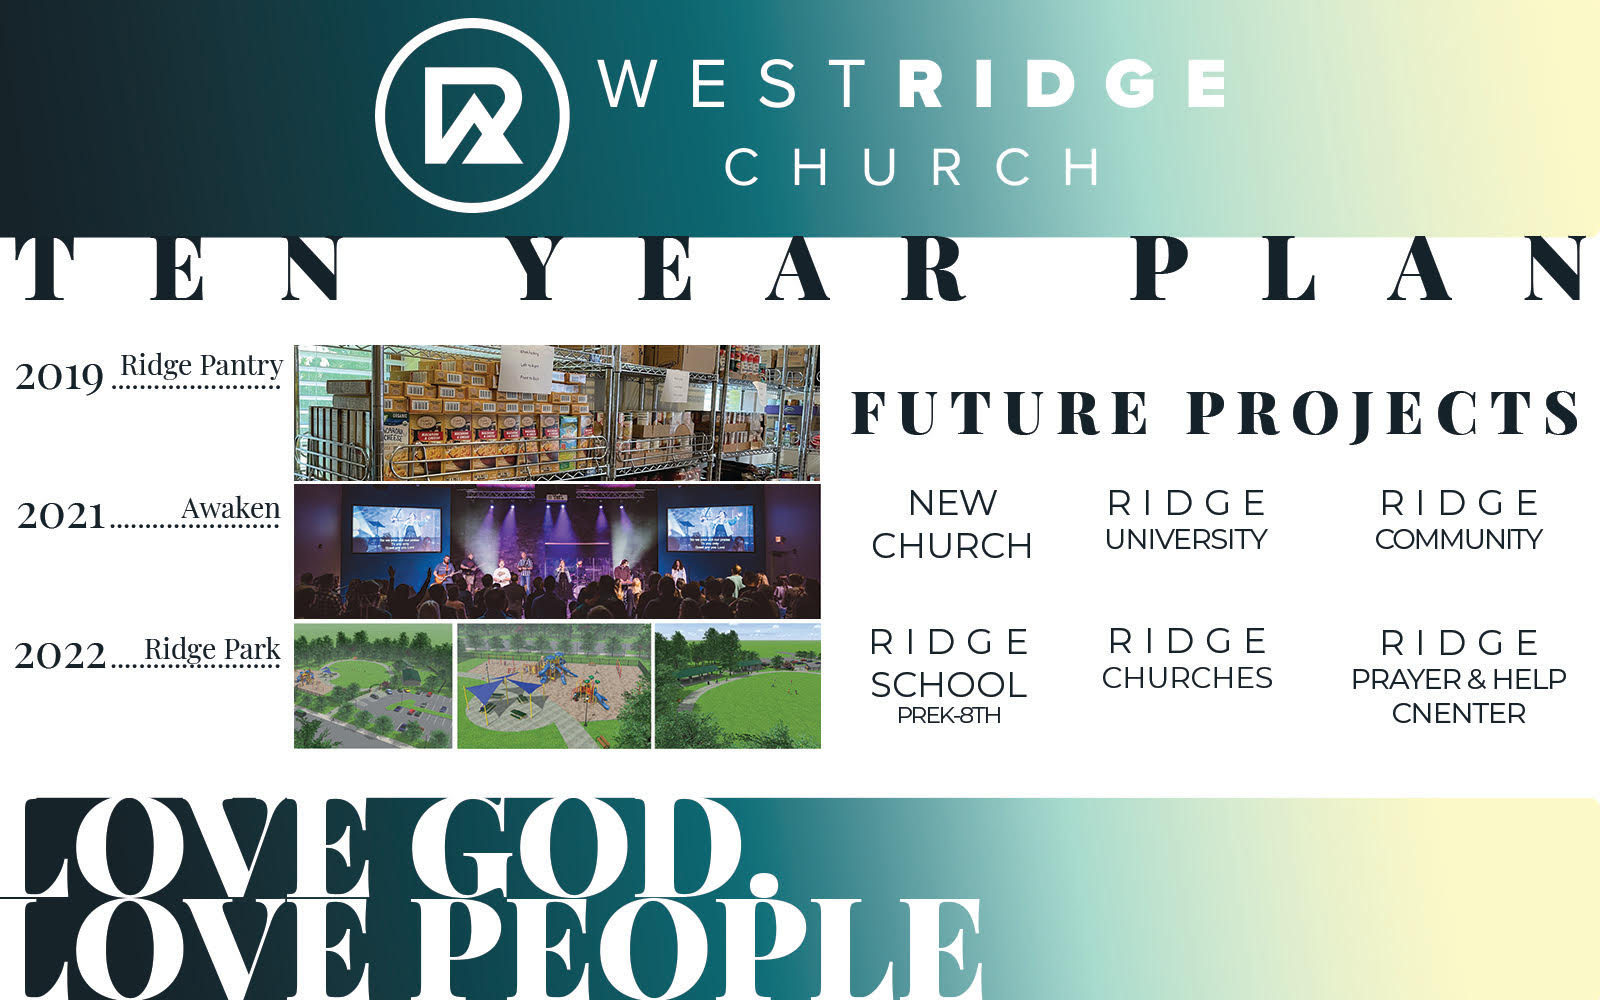 10 year vision plan summary for West Ridge Church